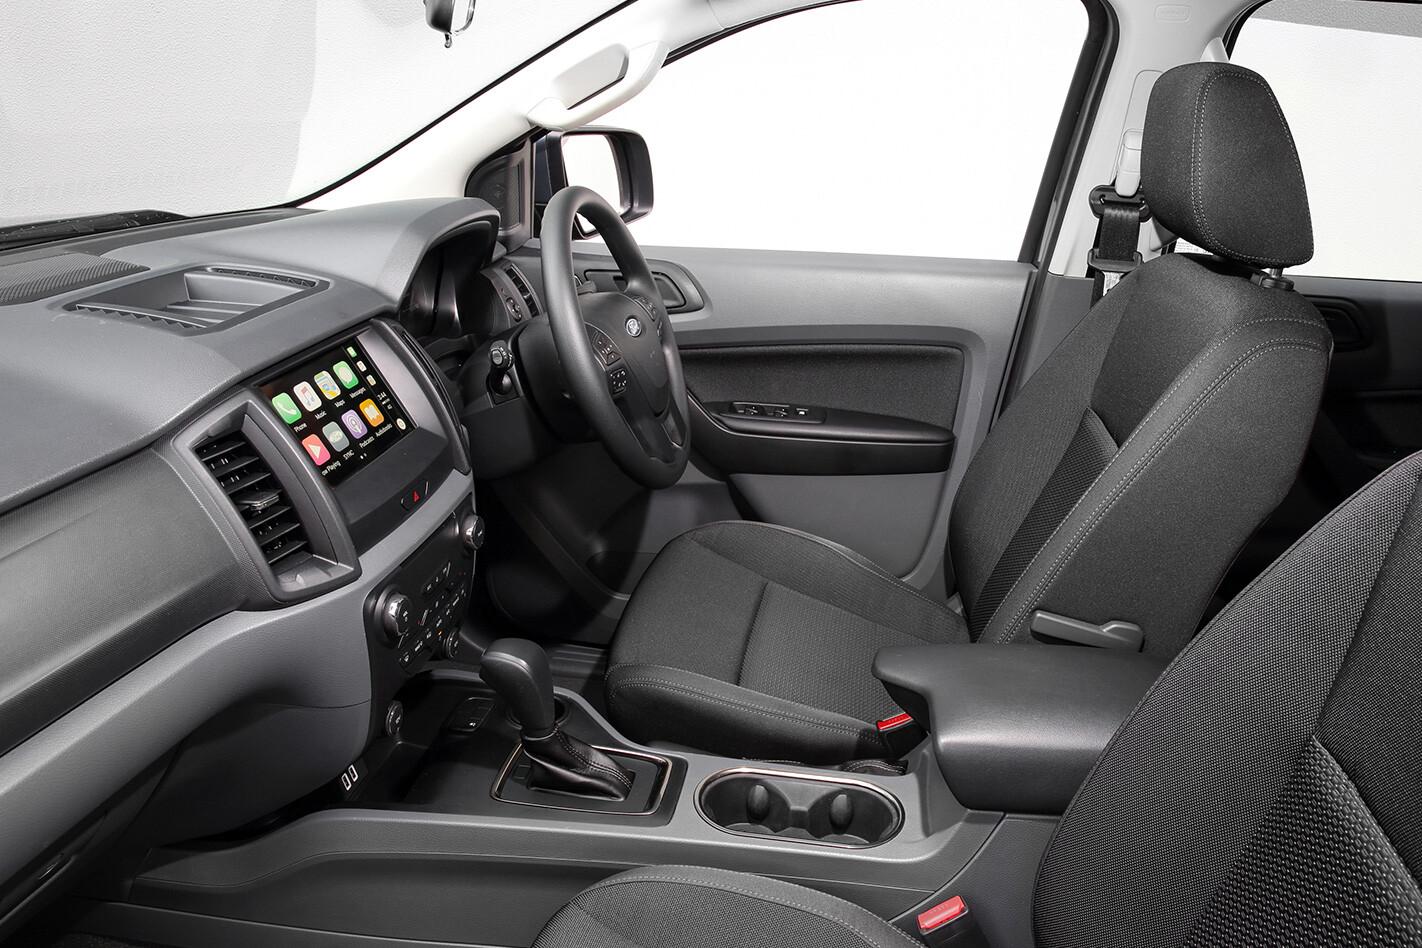 2018 Ford Everest interior